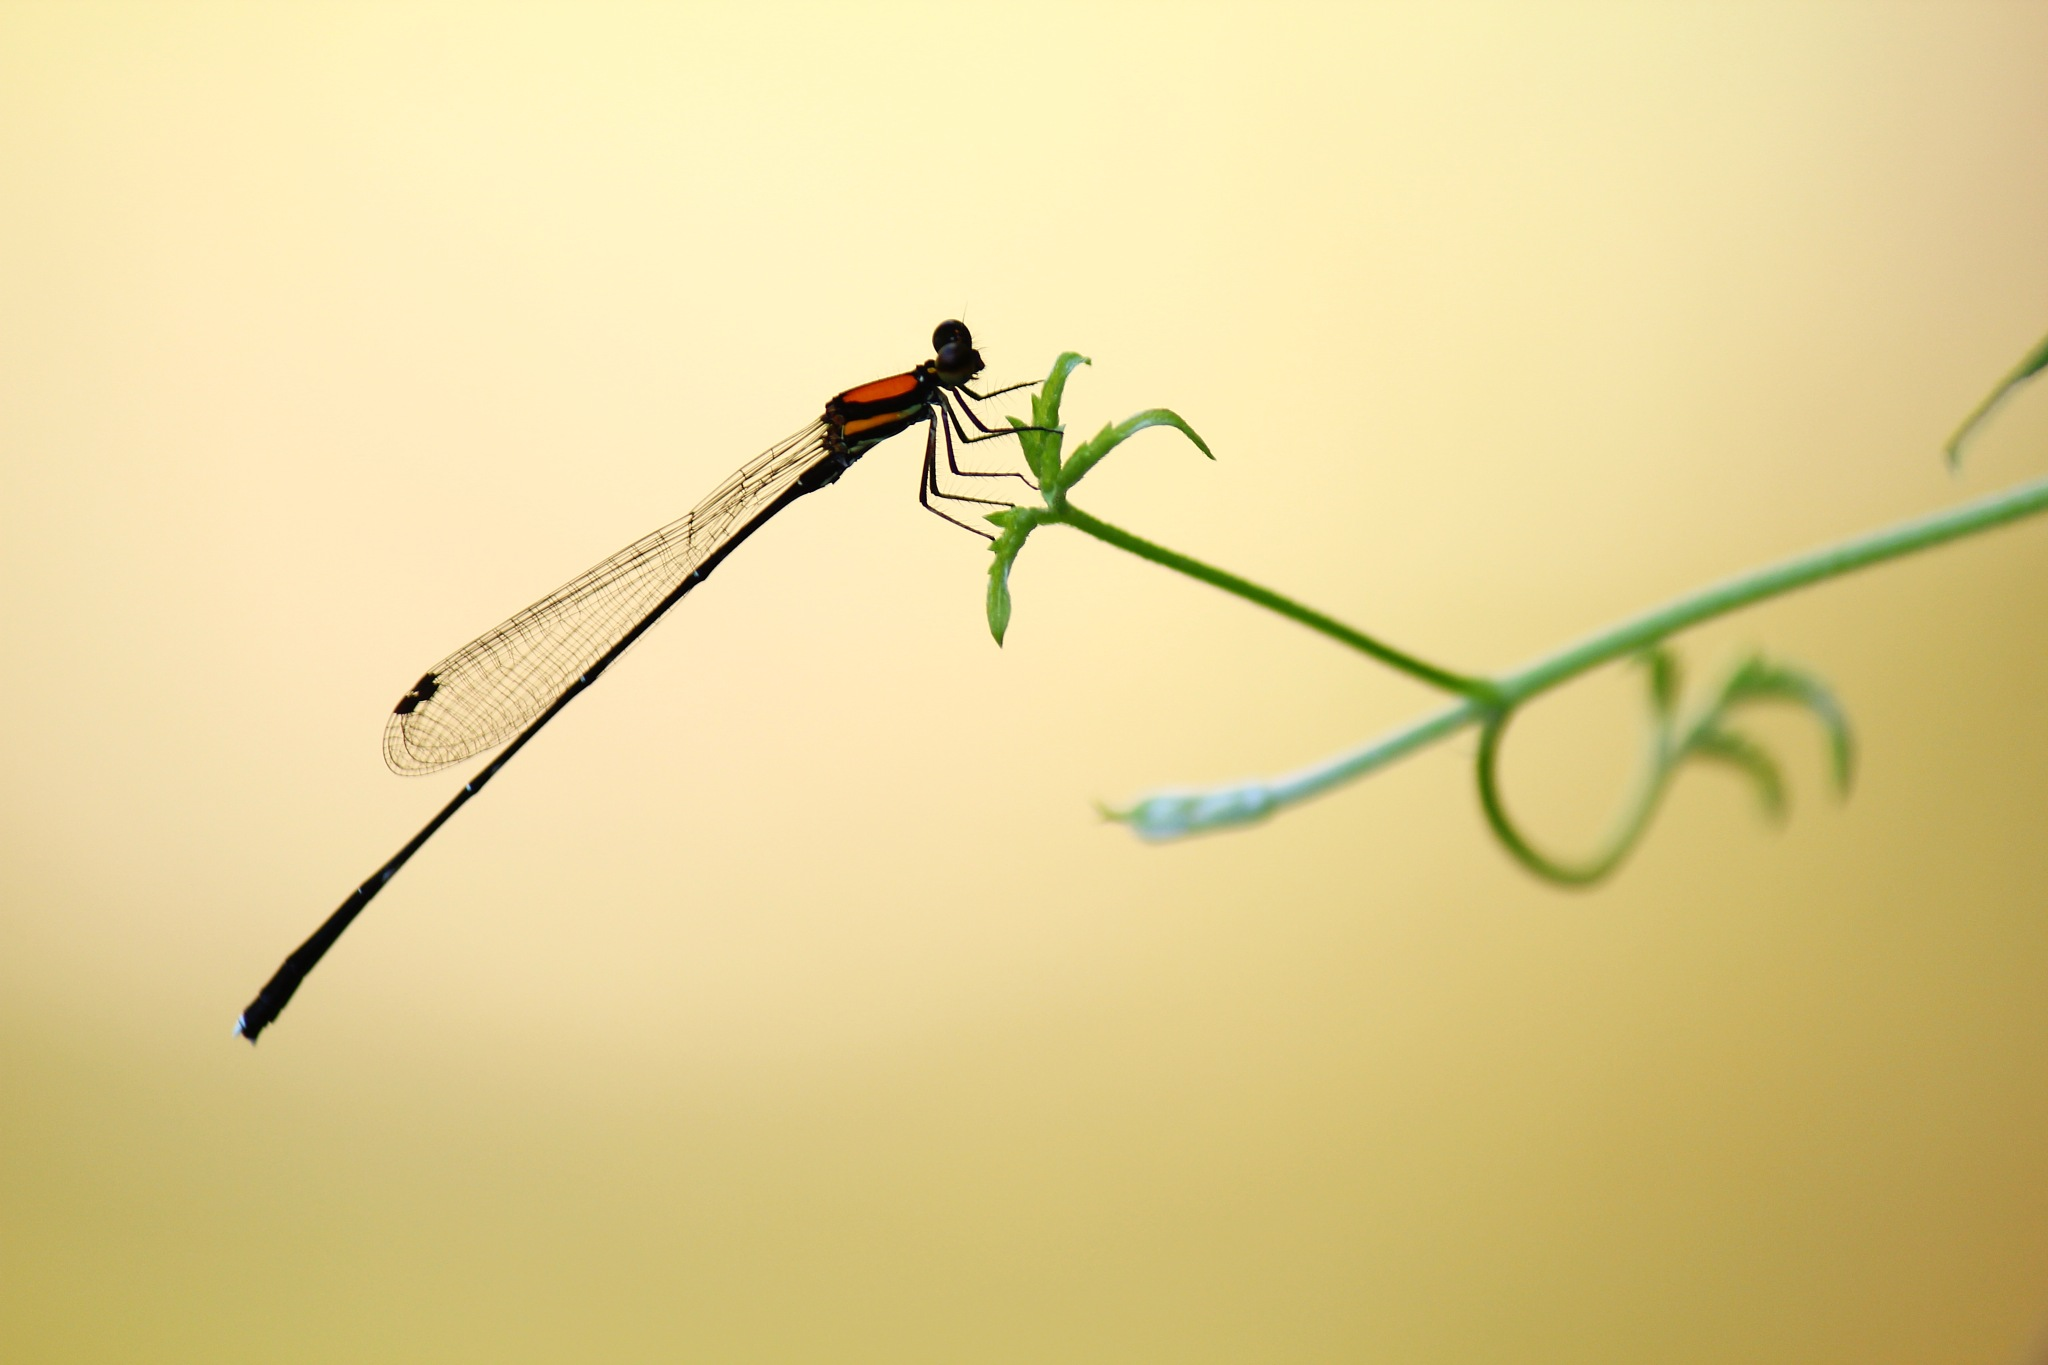 Danselfly by myhsu123